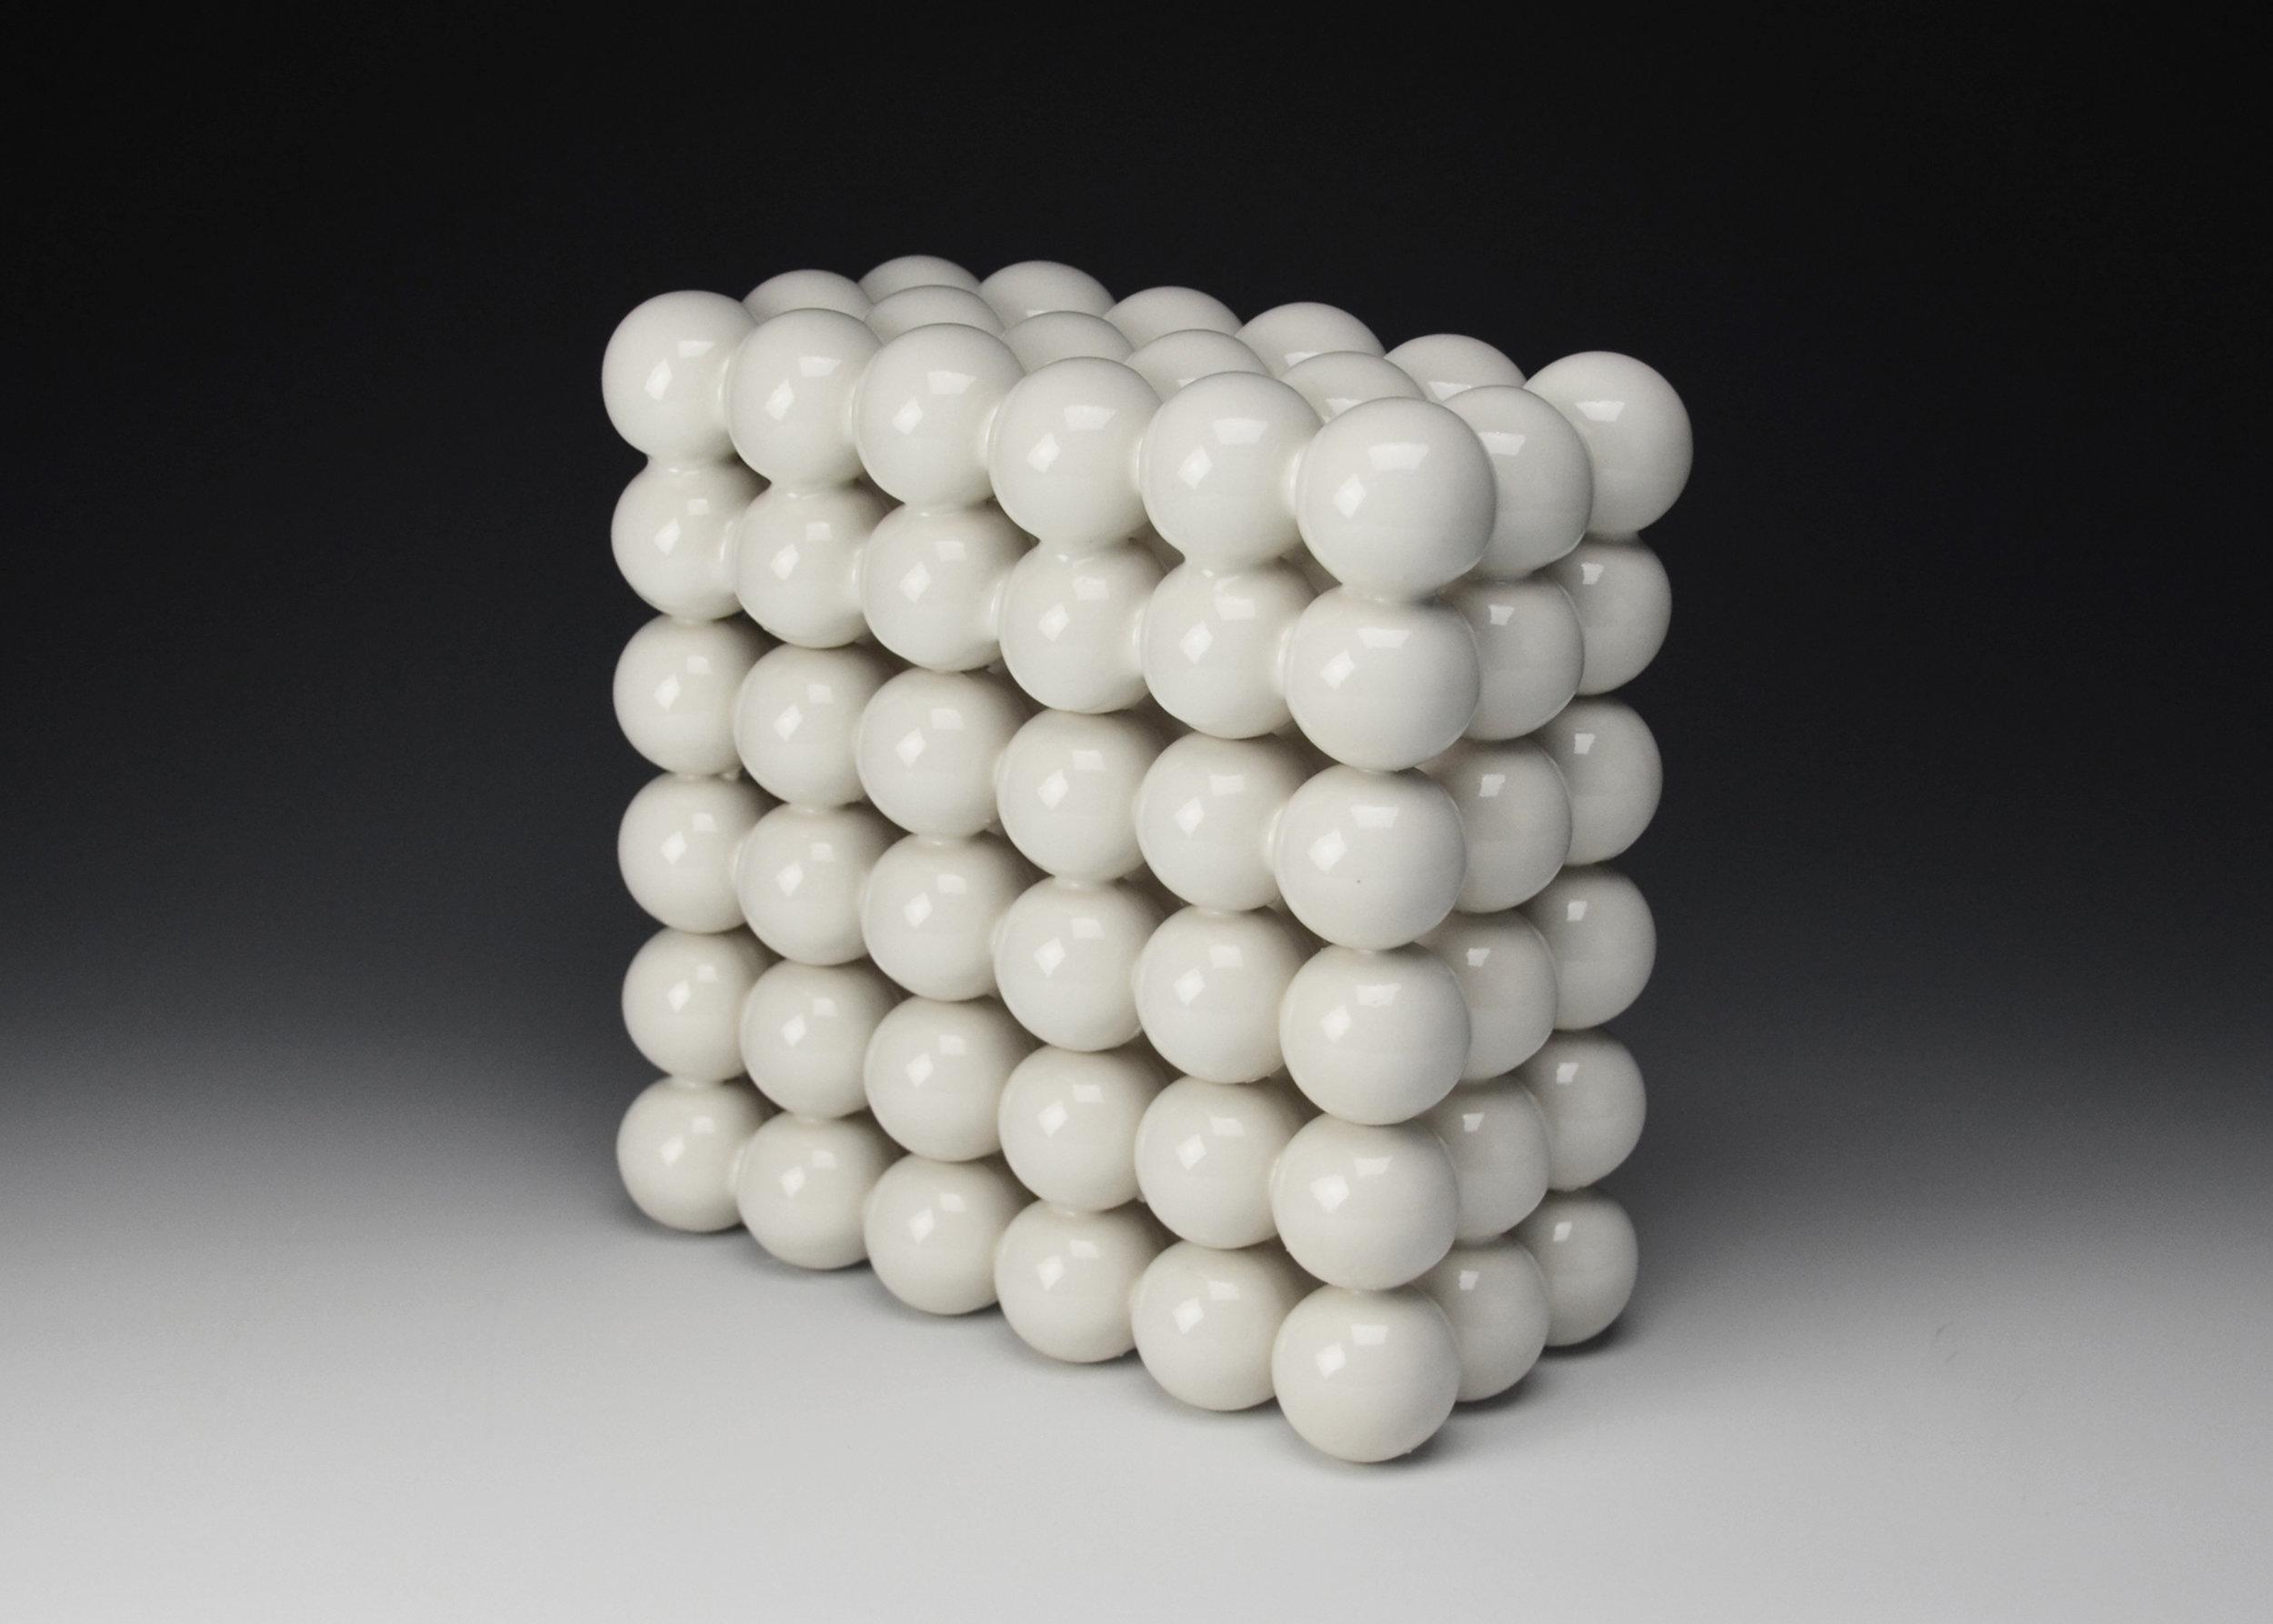 Ionic Series: Construction V  |  8 x 8 x 4 inches  |  Porcelain, Glaze  |  2017